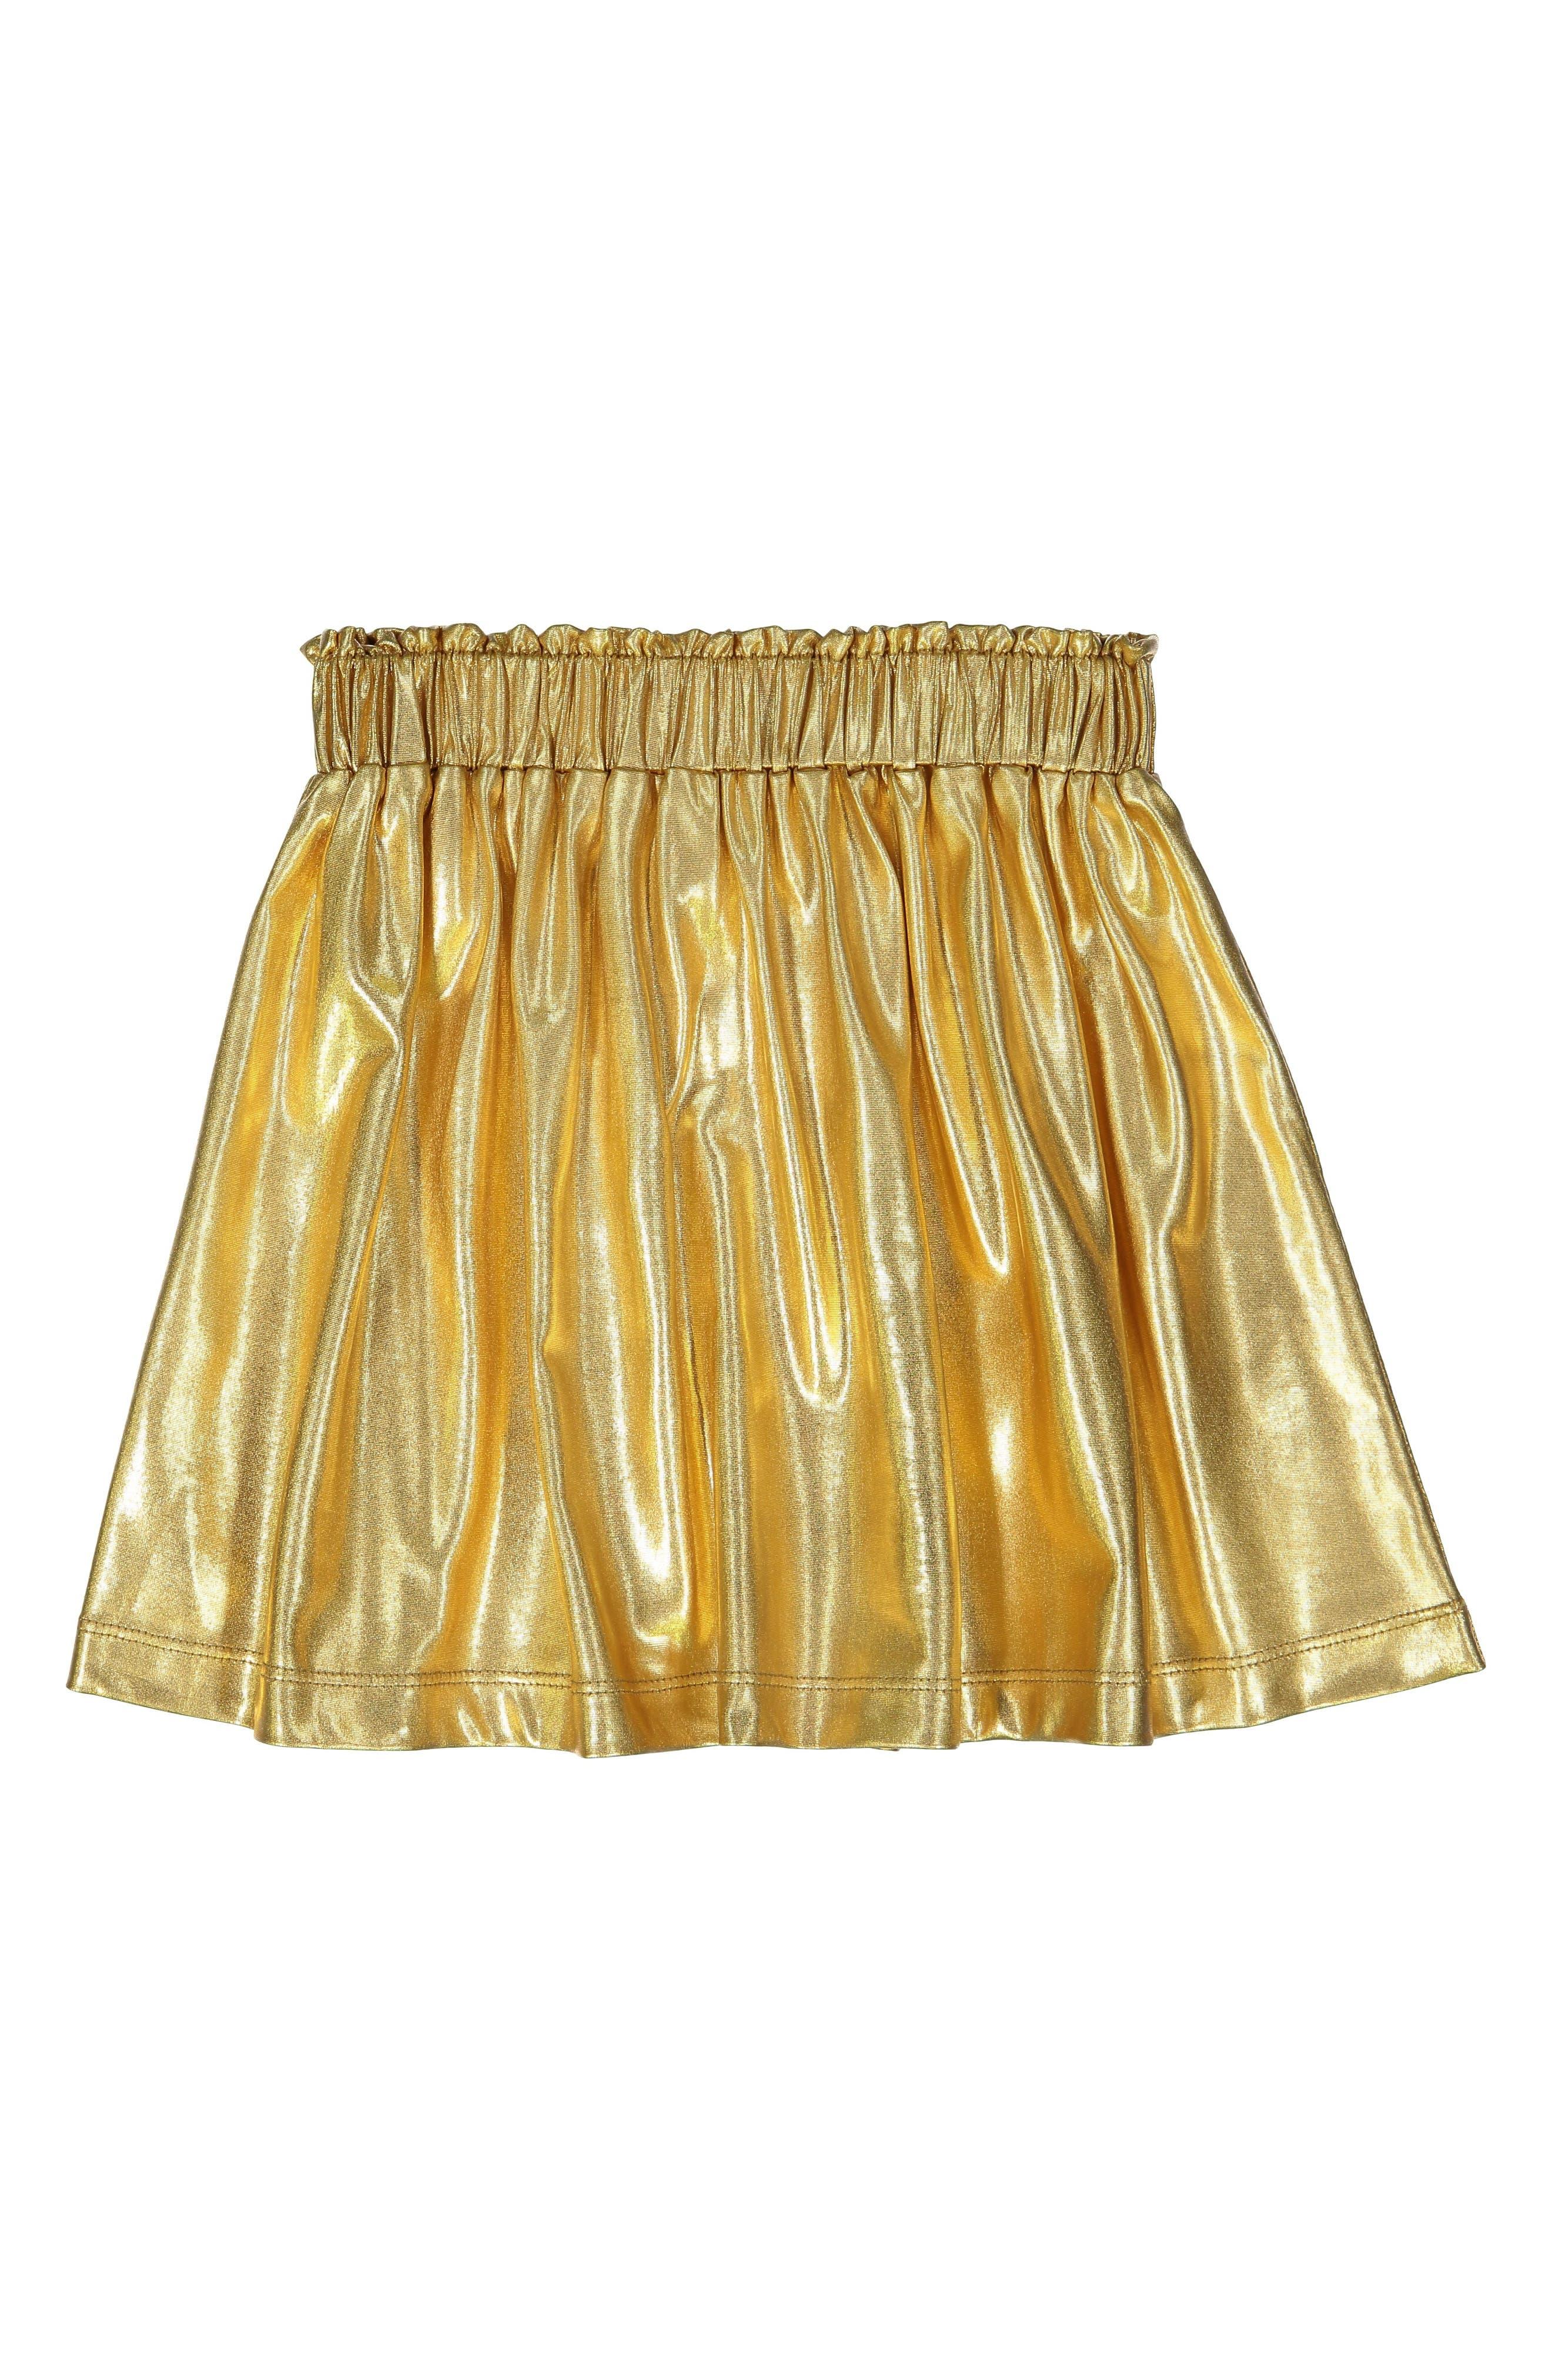 Girls Masala Baby Gold Metallic Skirt Size 8Y  Metallic